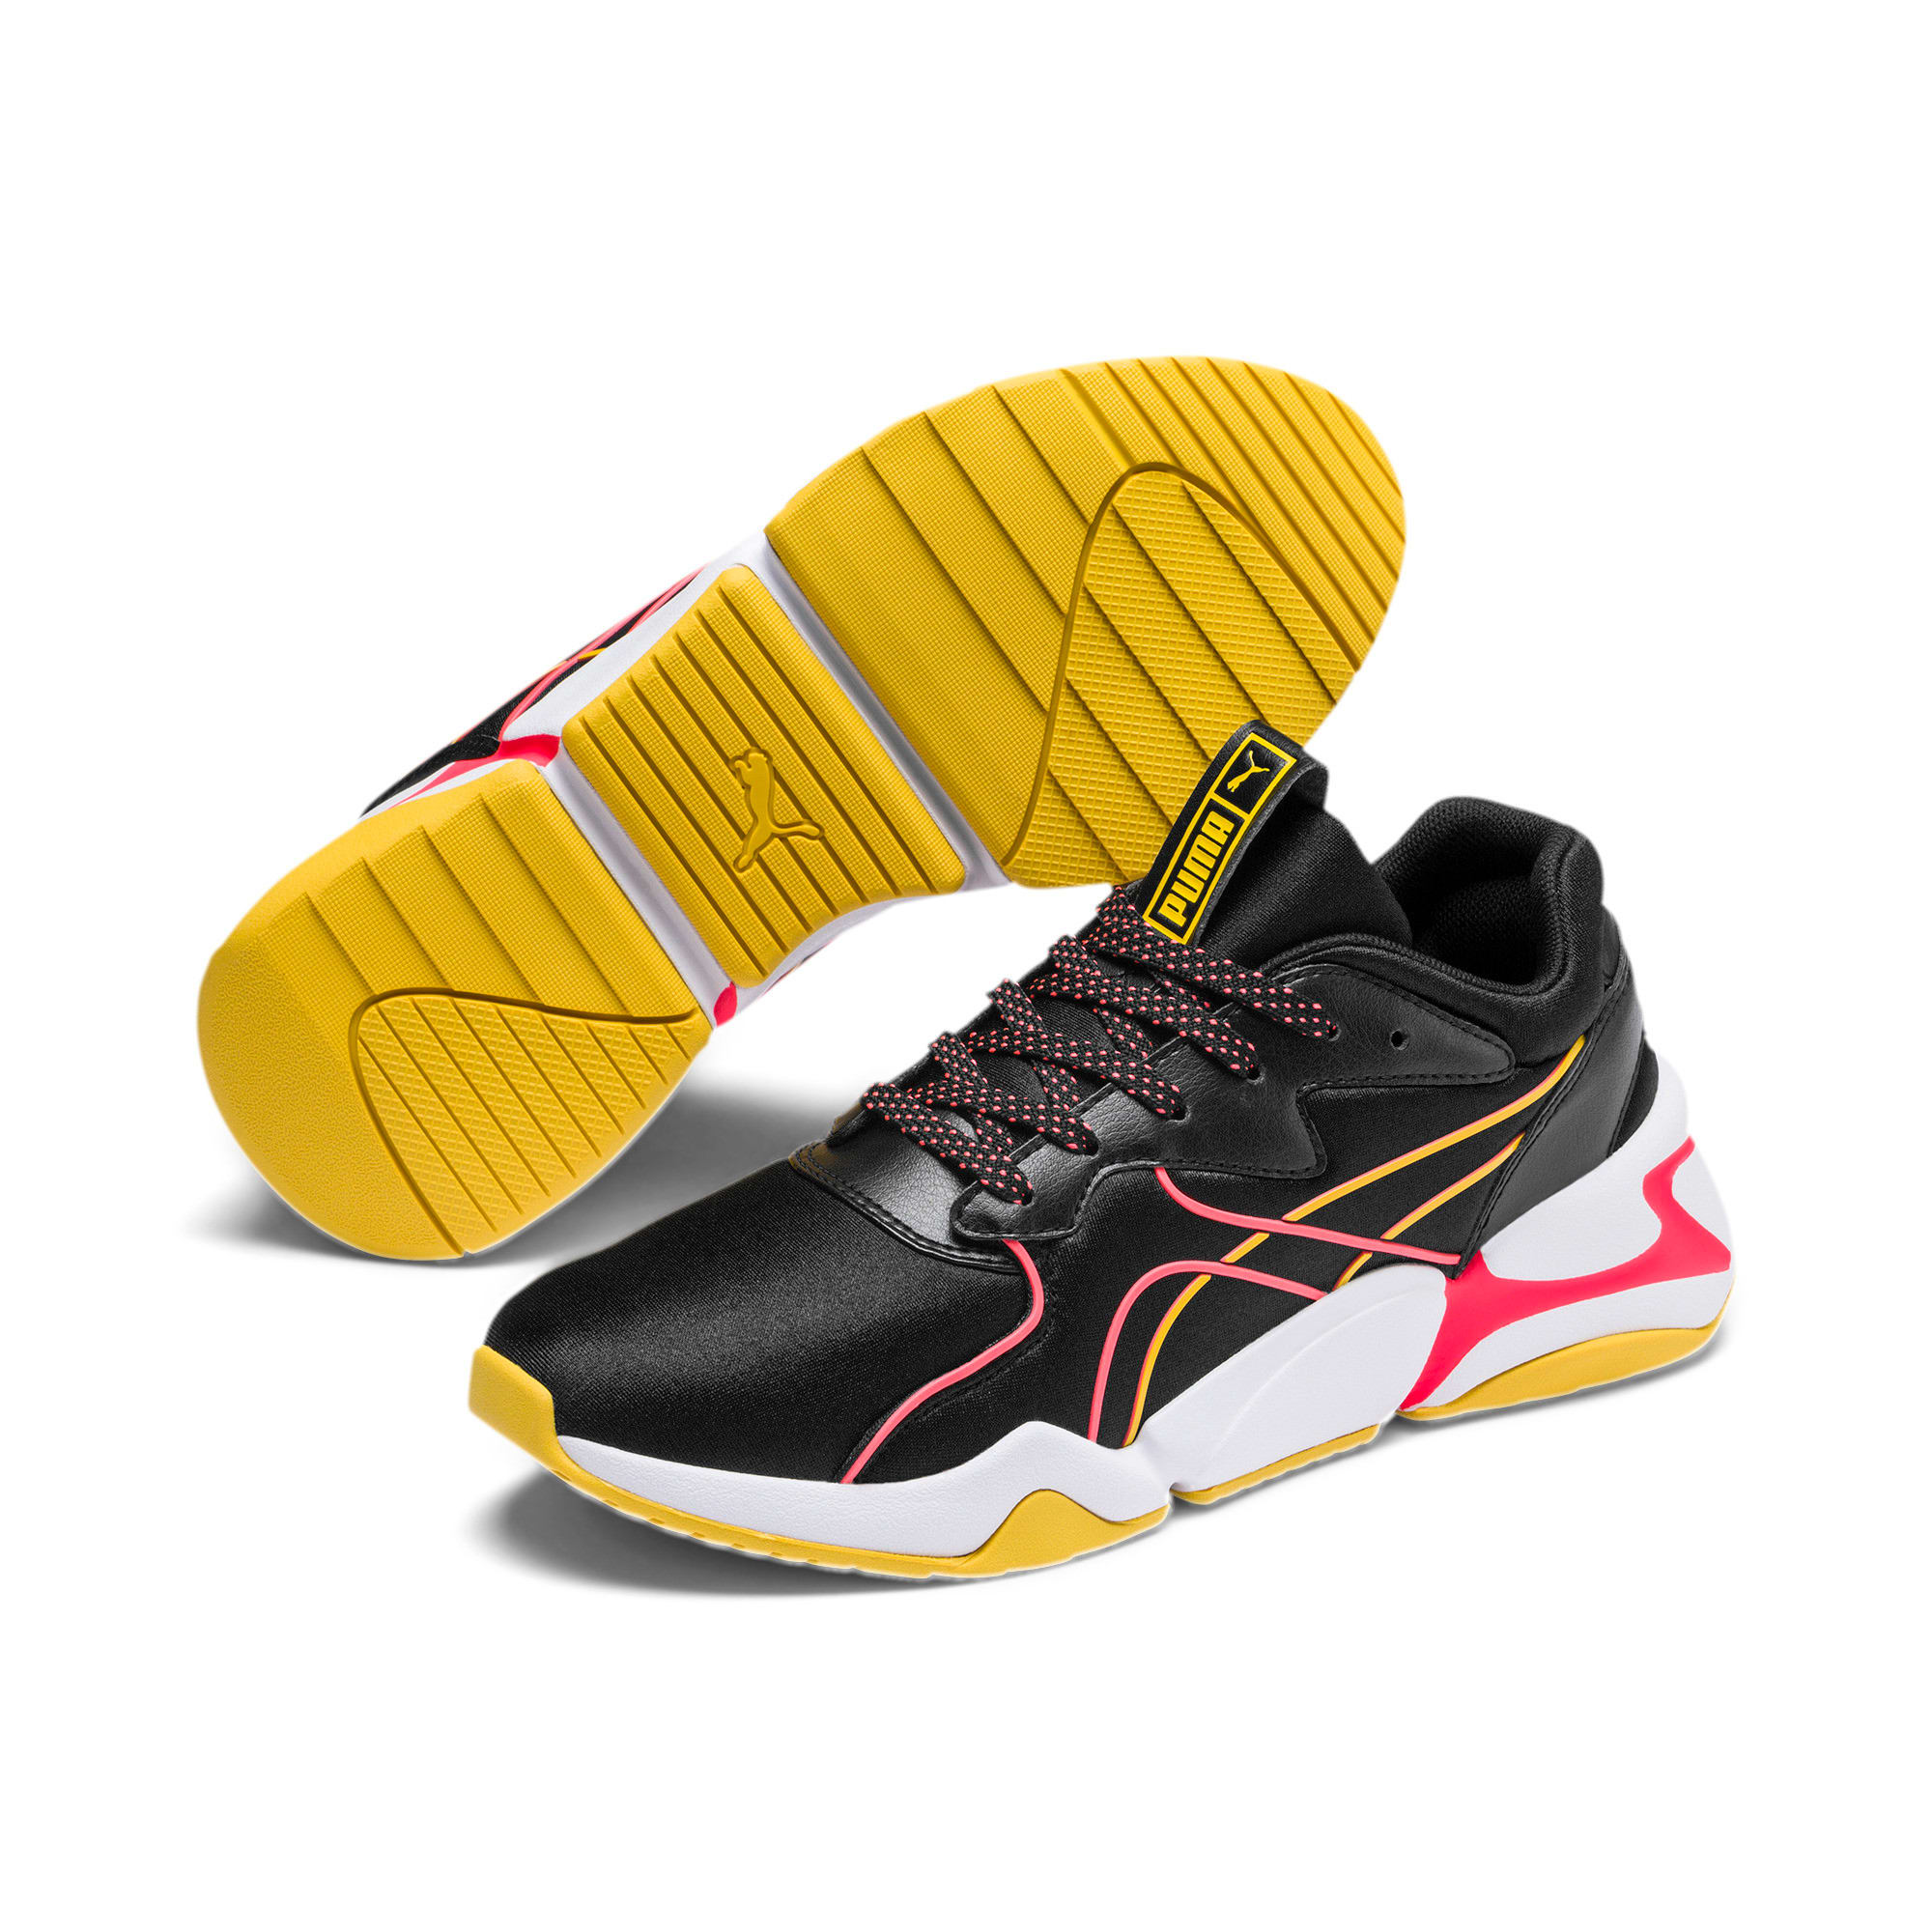 Thumbnail 3 of Nova Hypertech IMEVA sportschoenen voor dames, Puma Black, medium